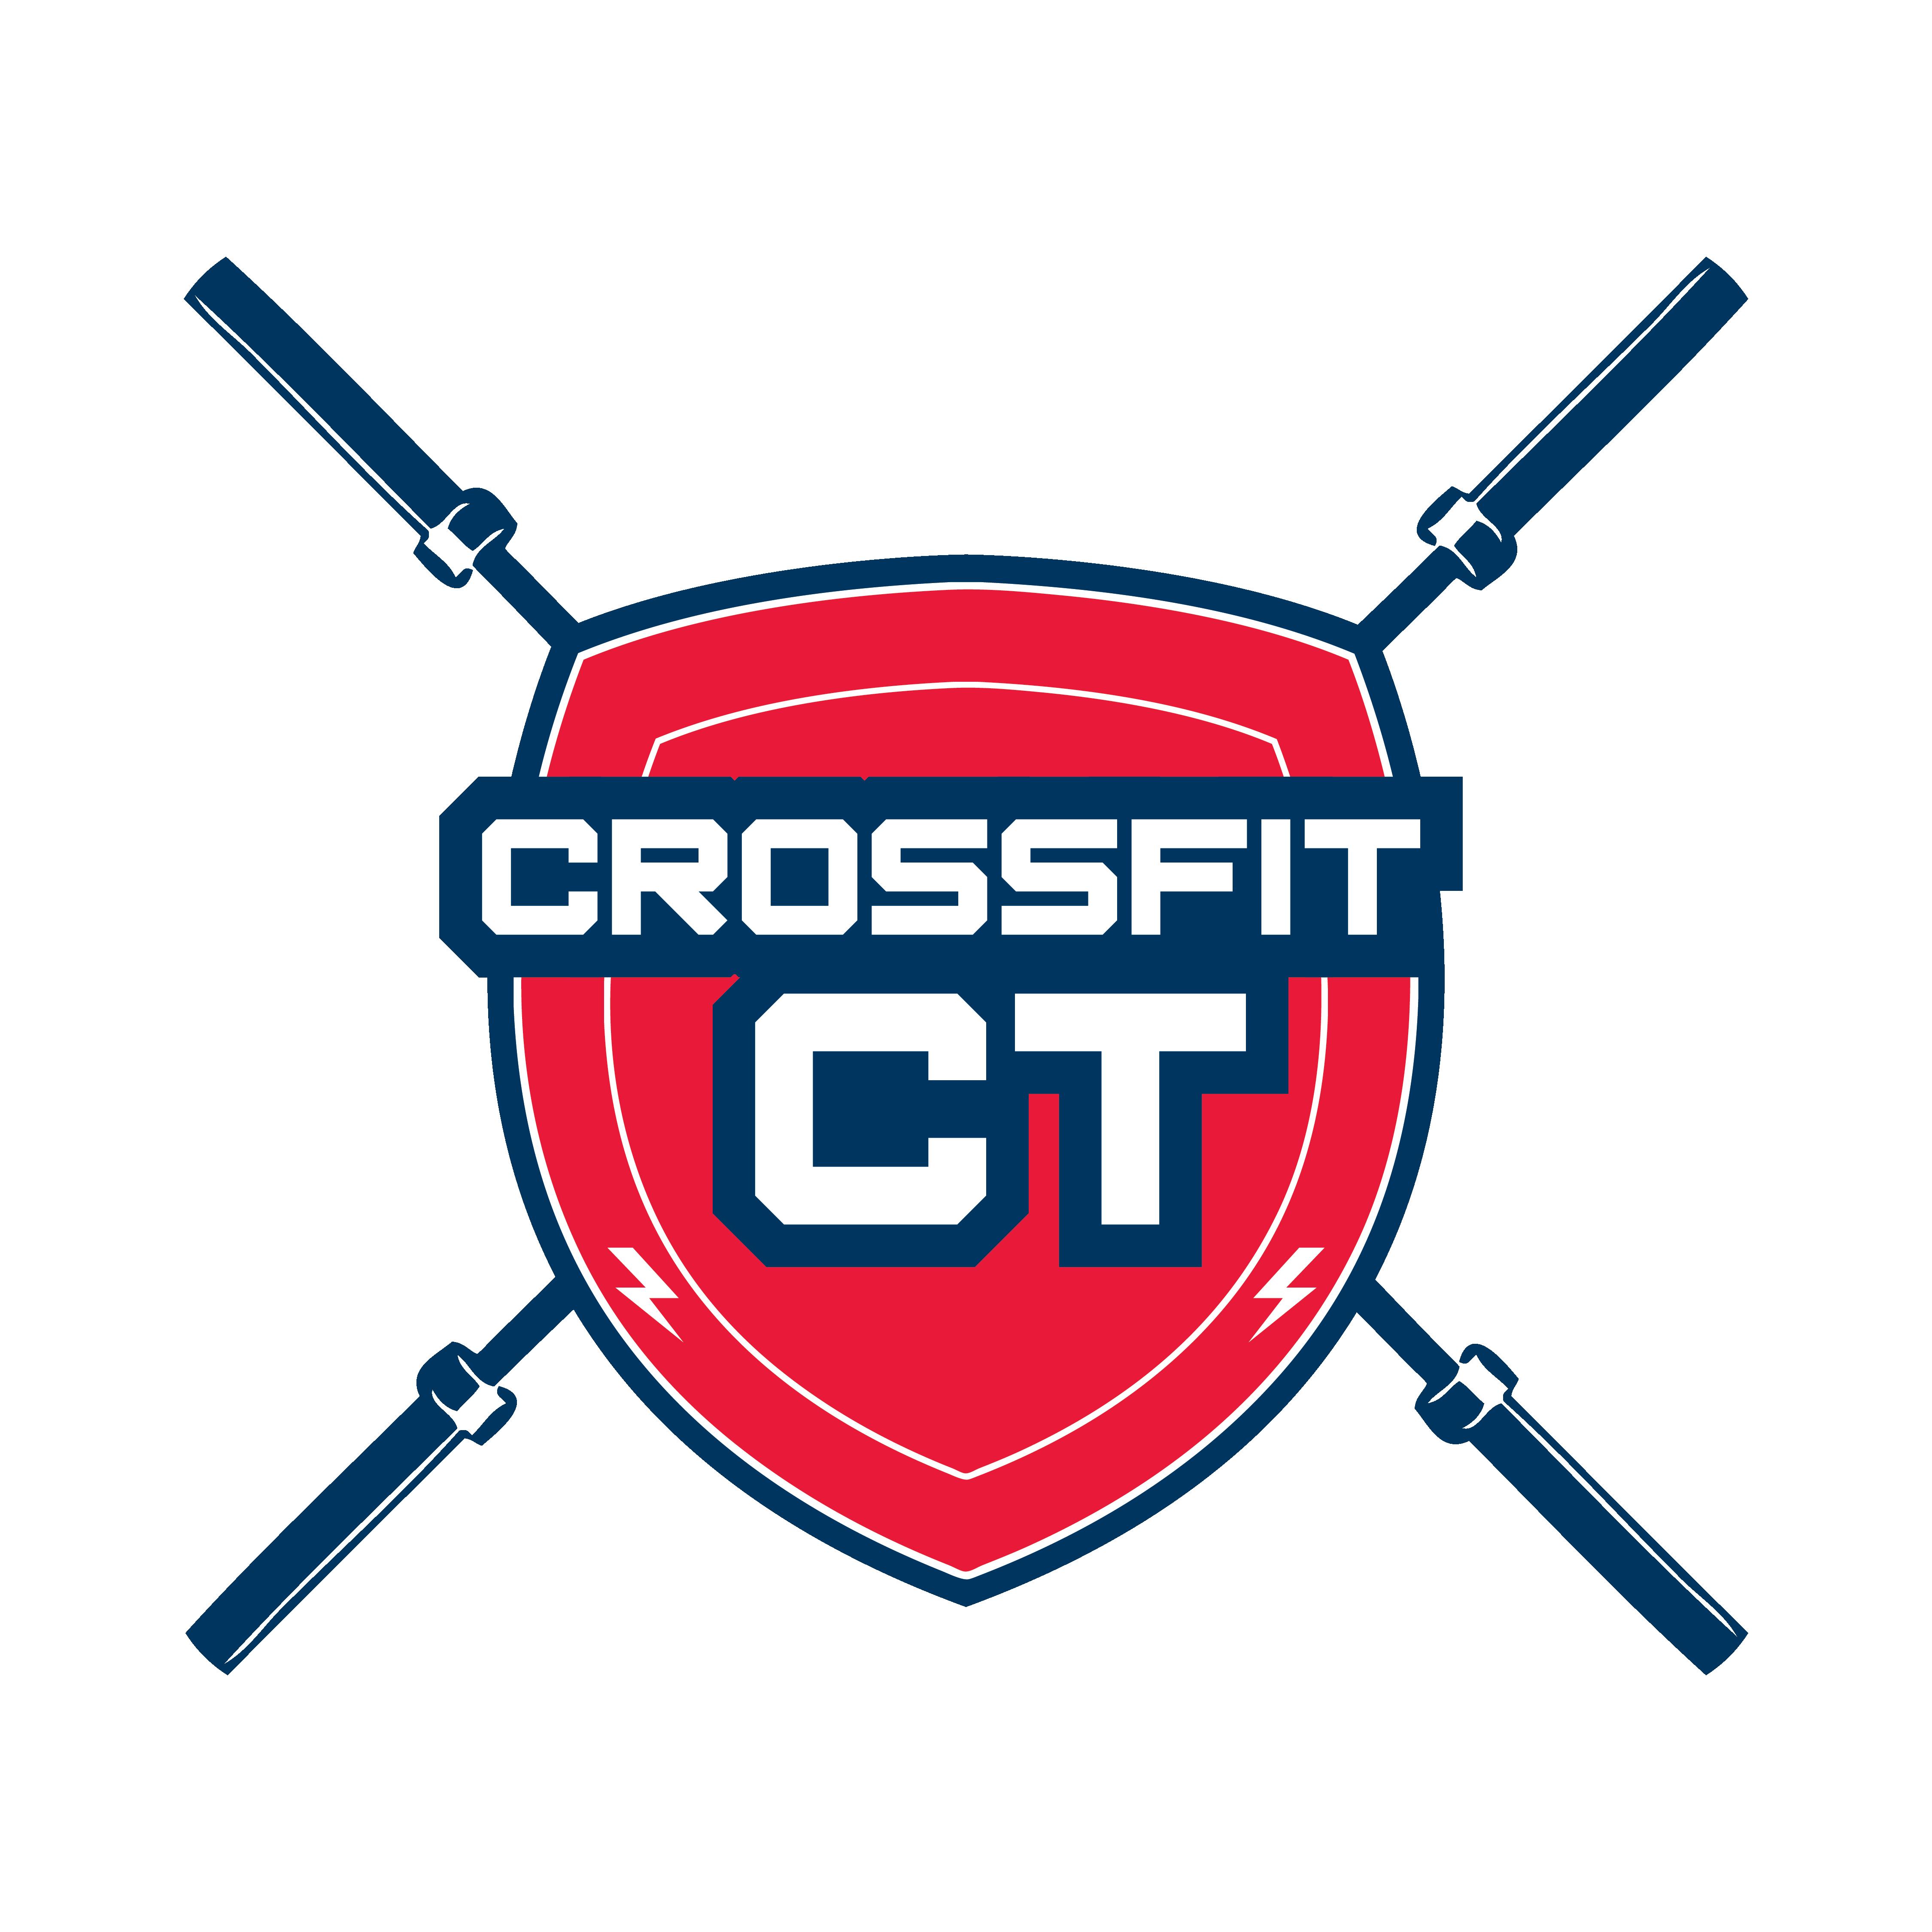 CrossFit CT